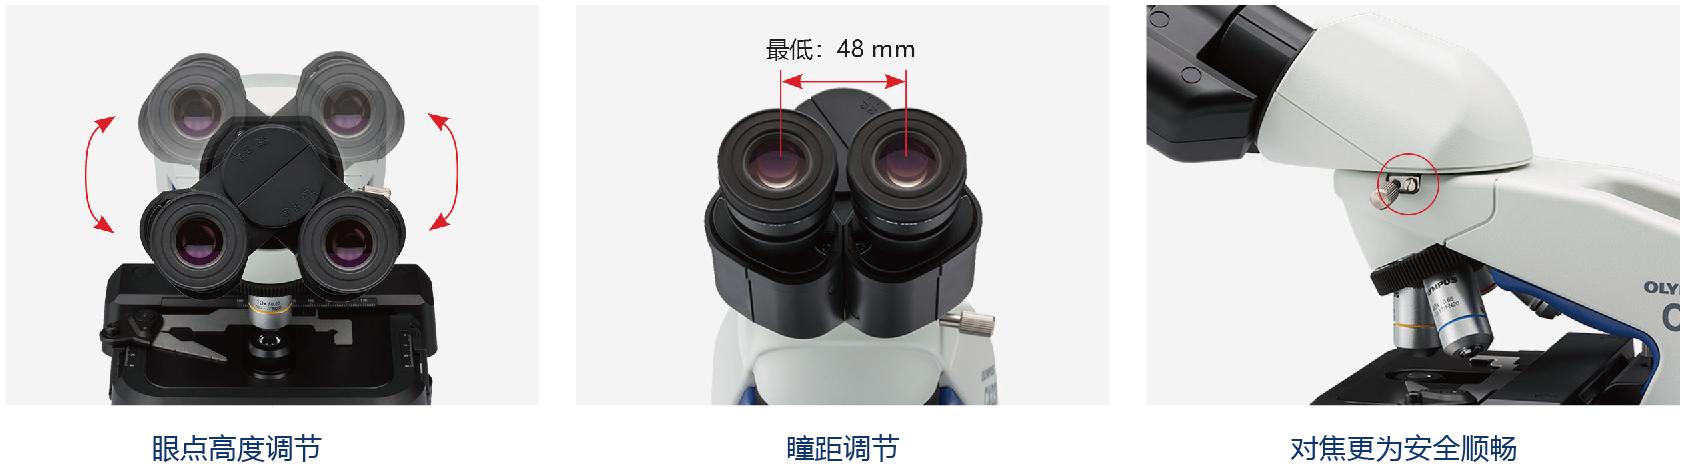 OLYMPUS奥林巴斯 CX23生物显微镜 【三目 双目 荧光 相差】-普赫光电